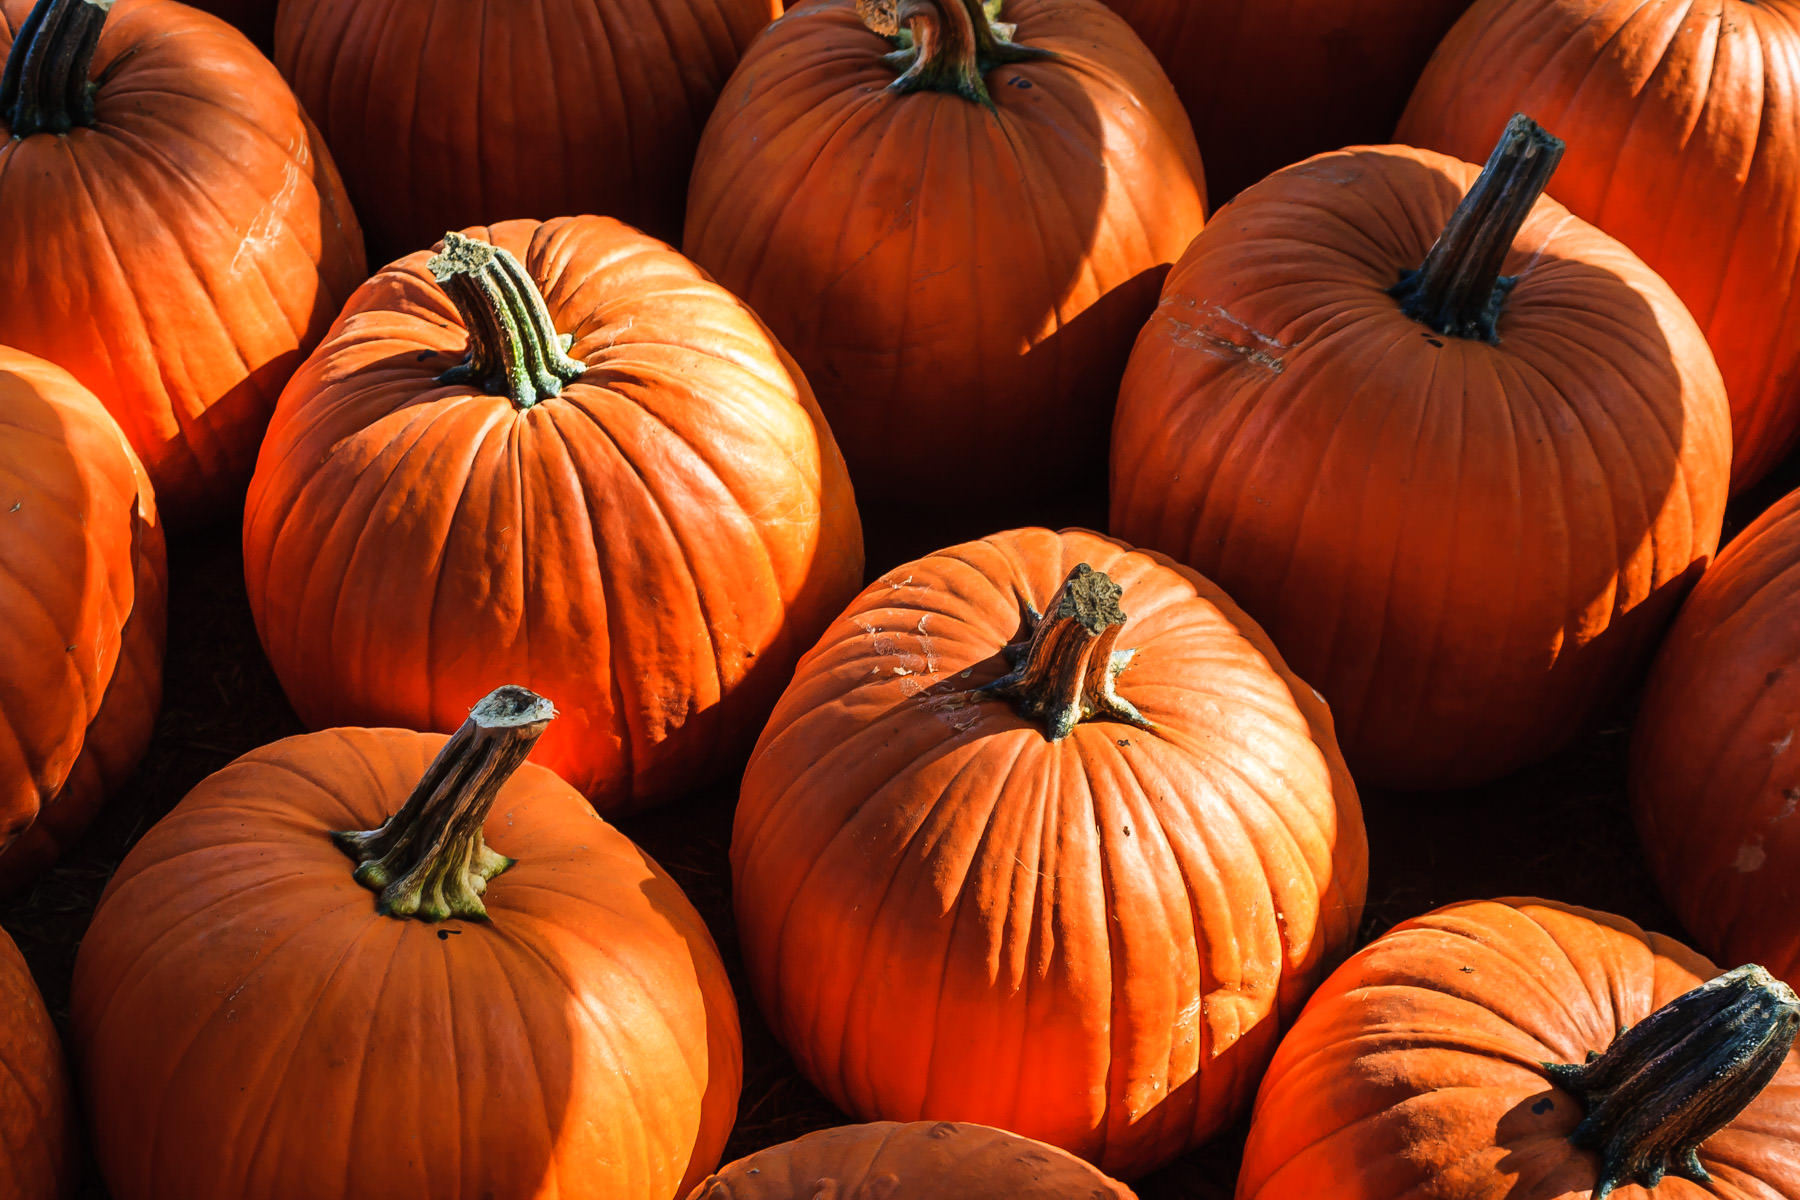 Pumpkins at Moore Farms, Bullard, Texas.